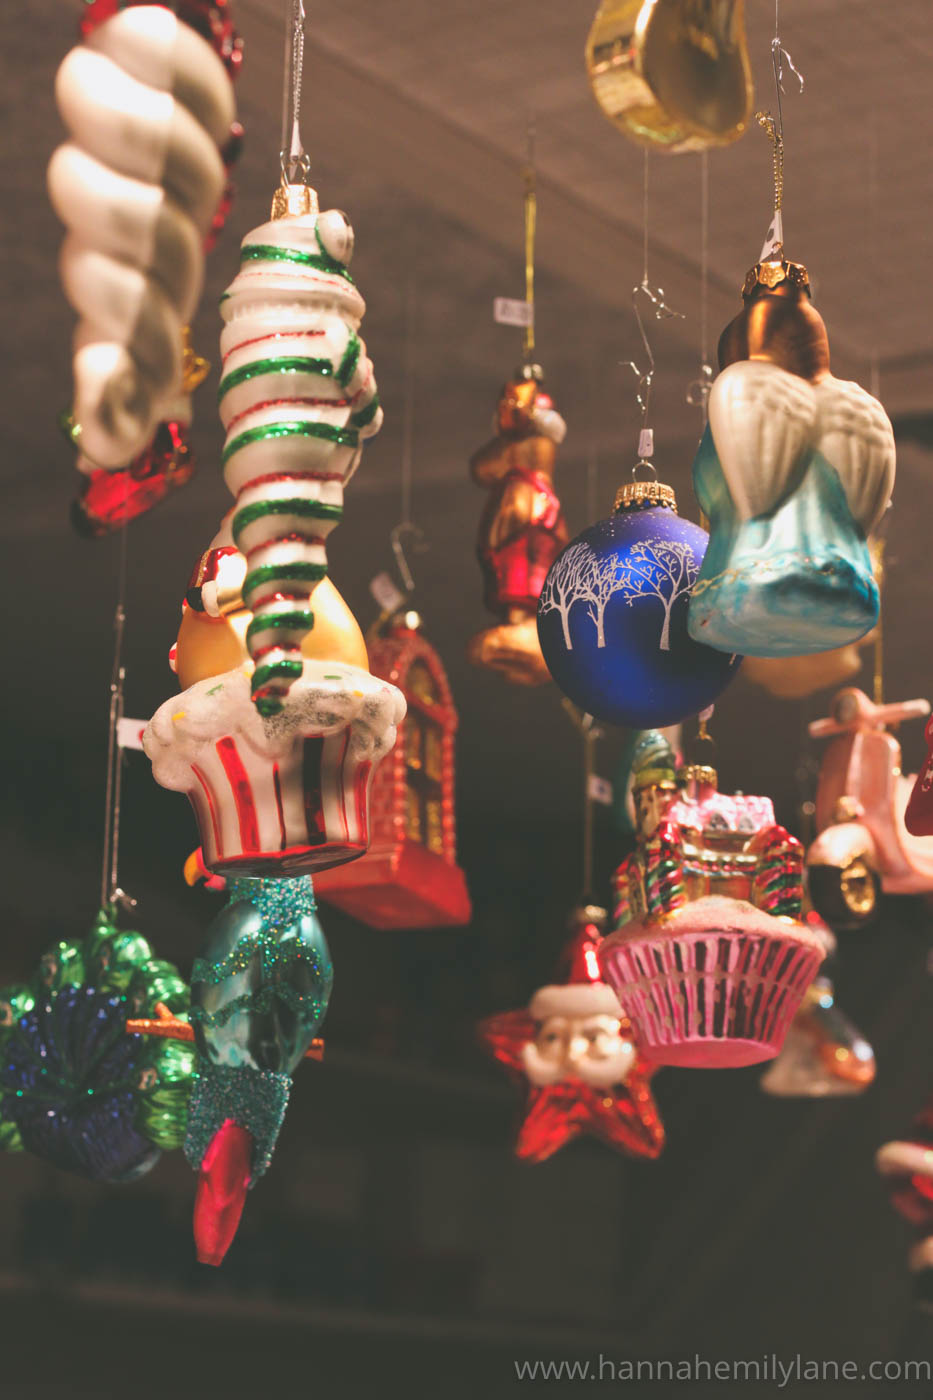 Birmingham Christmas Markets | www.hannahemilylane.com-10.jpg